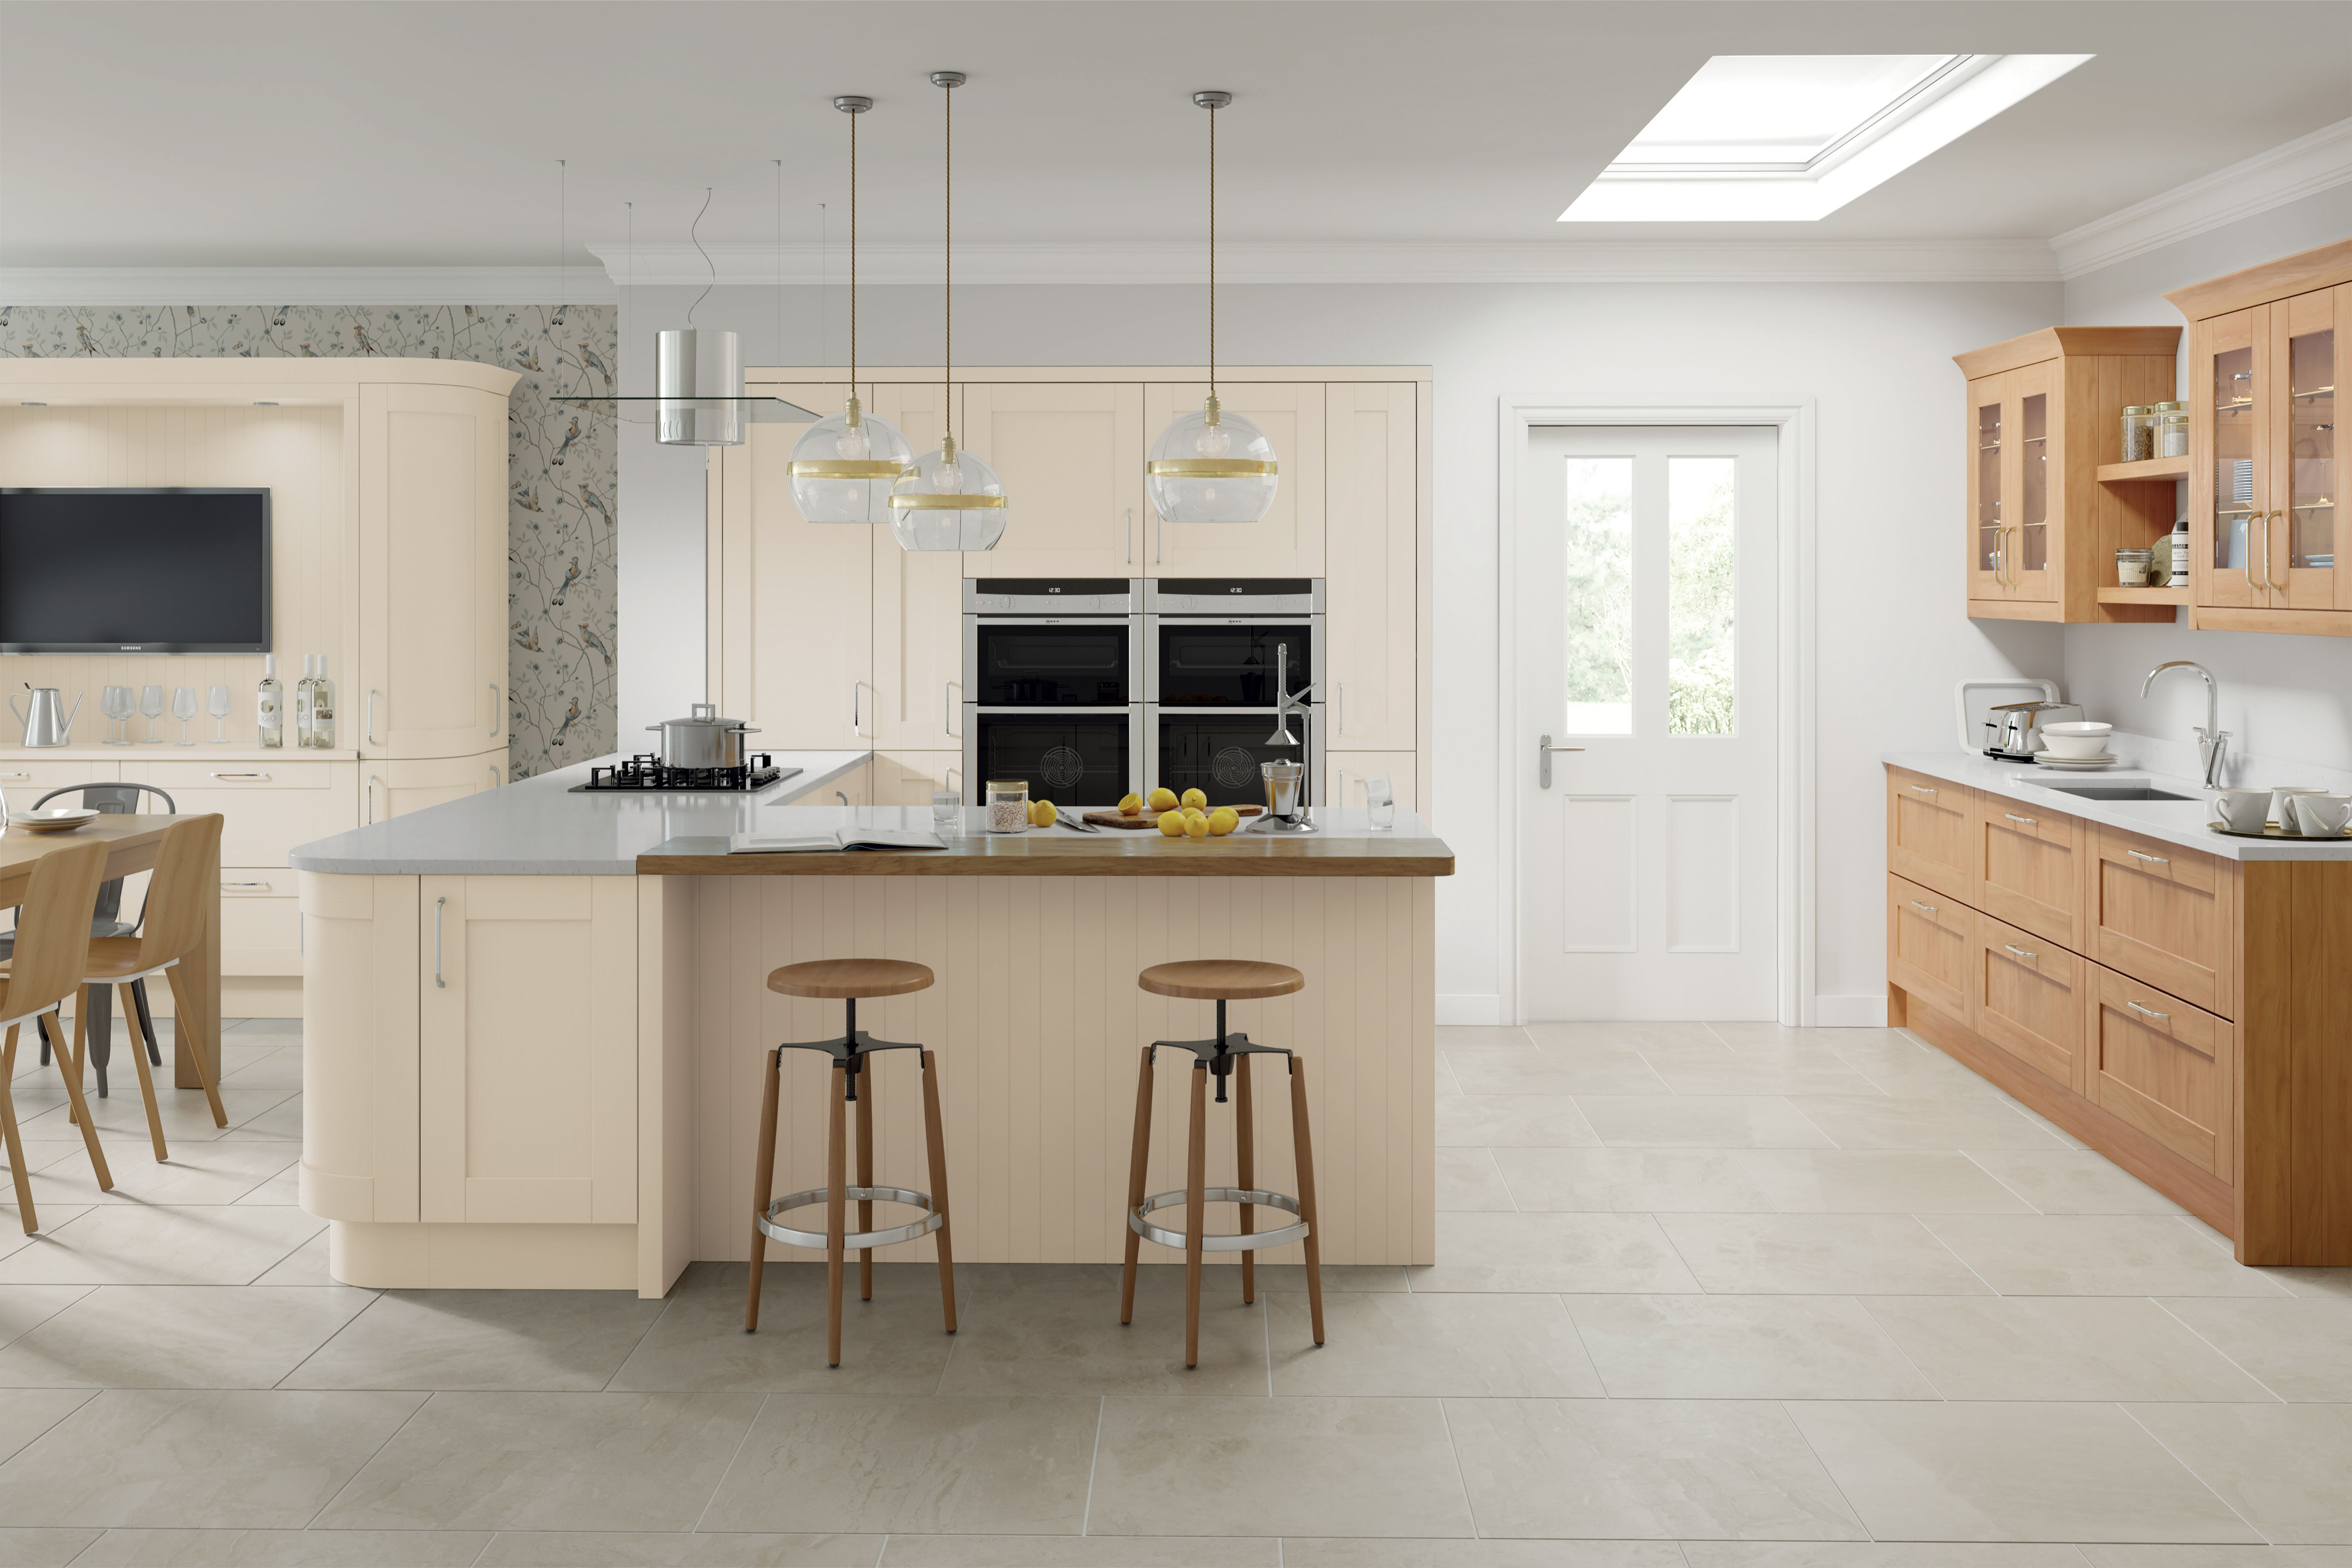 Cambridge Hand Painted Chalkstone | Light grey kitchens ...